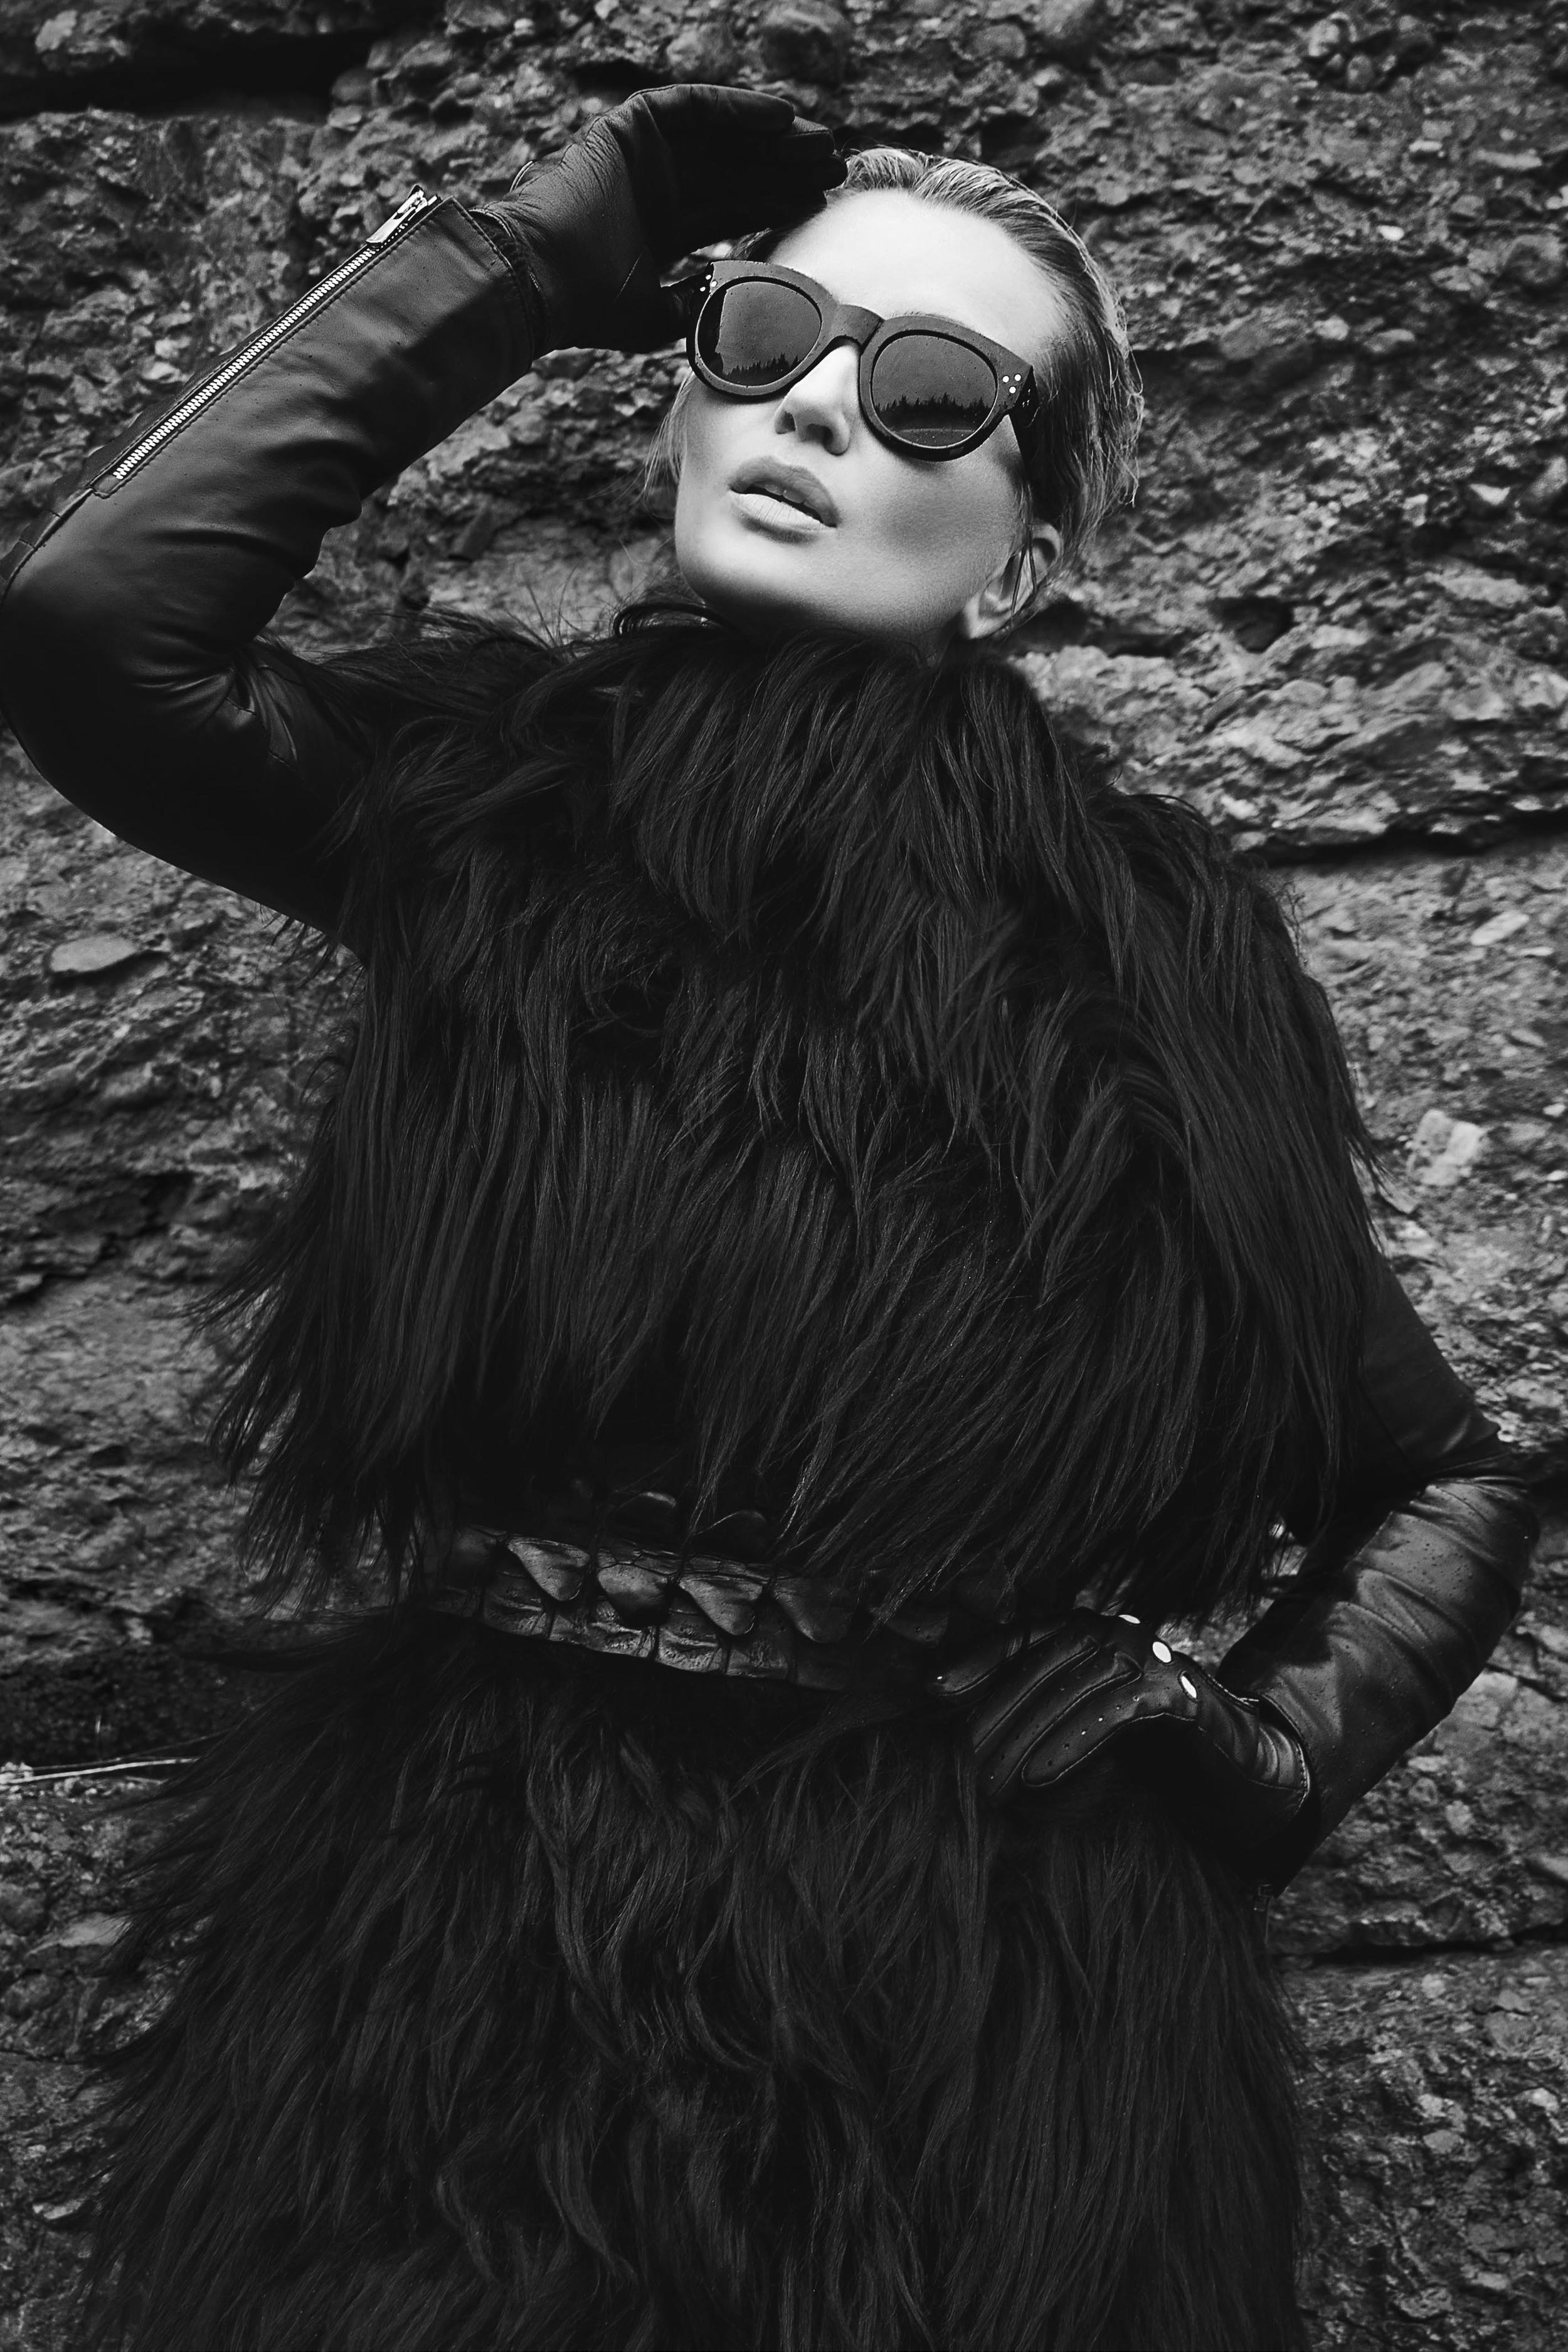 Introducing Rigor Luxe: Miranda Murray's Sleek and Sturdy Outerwear  – divine.ca, November 14, 2014